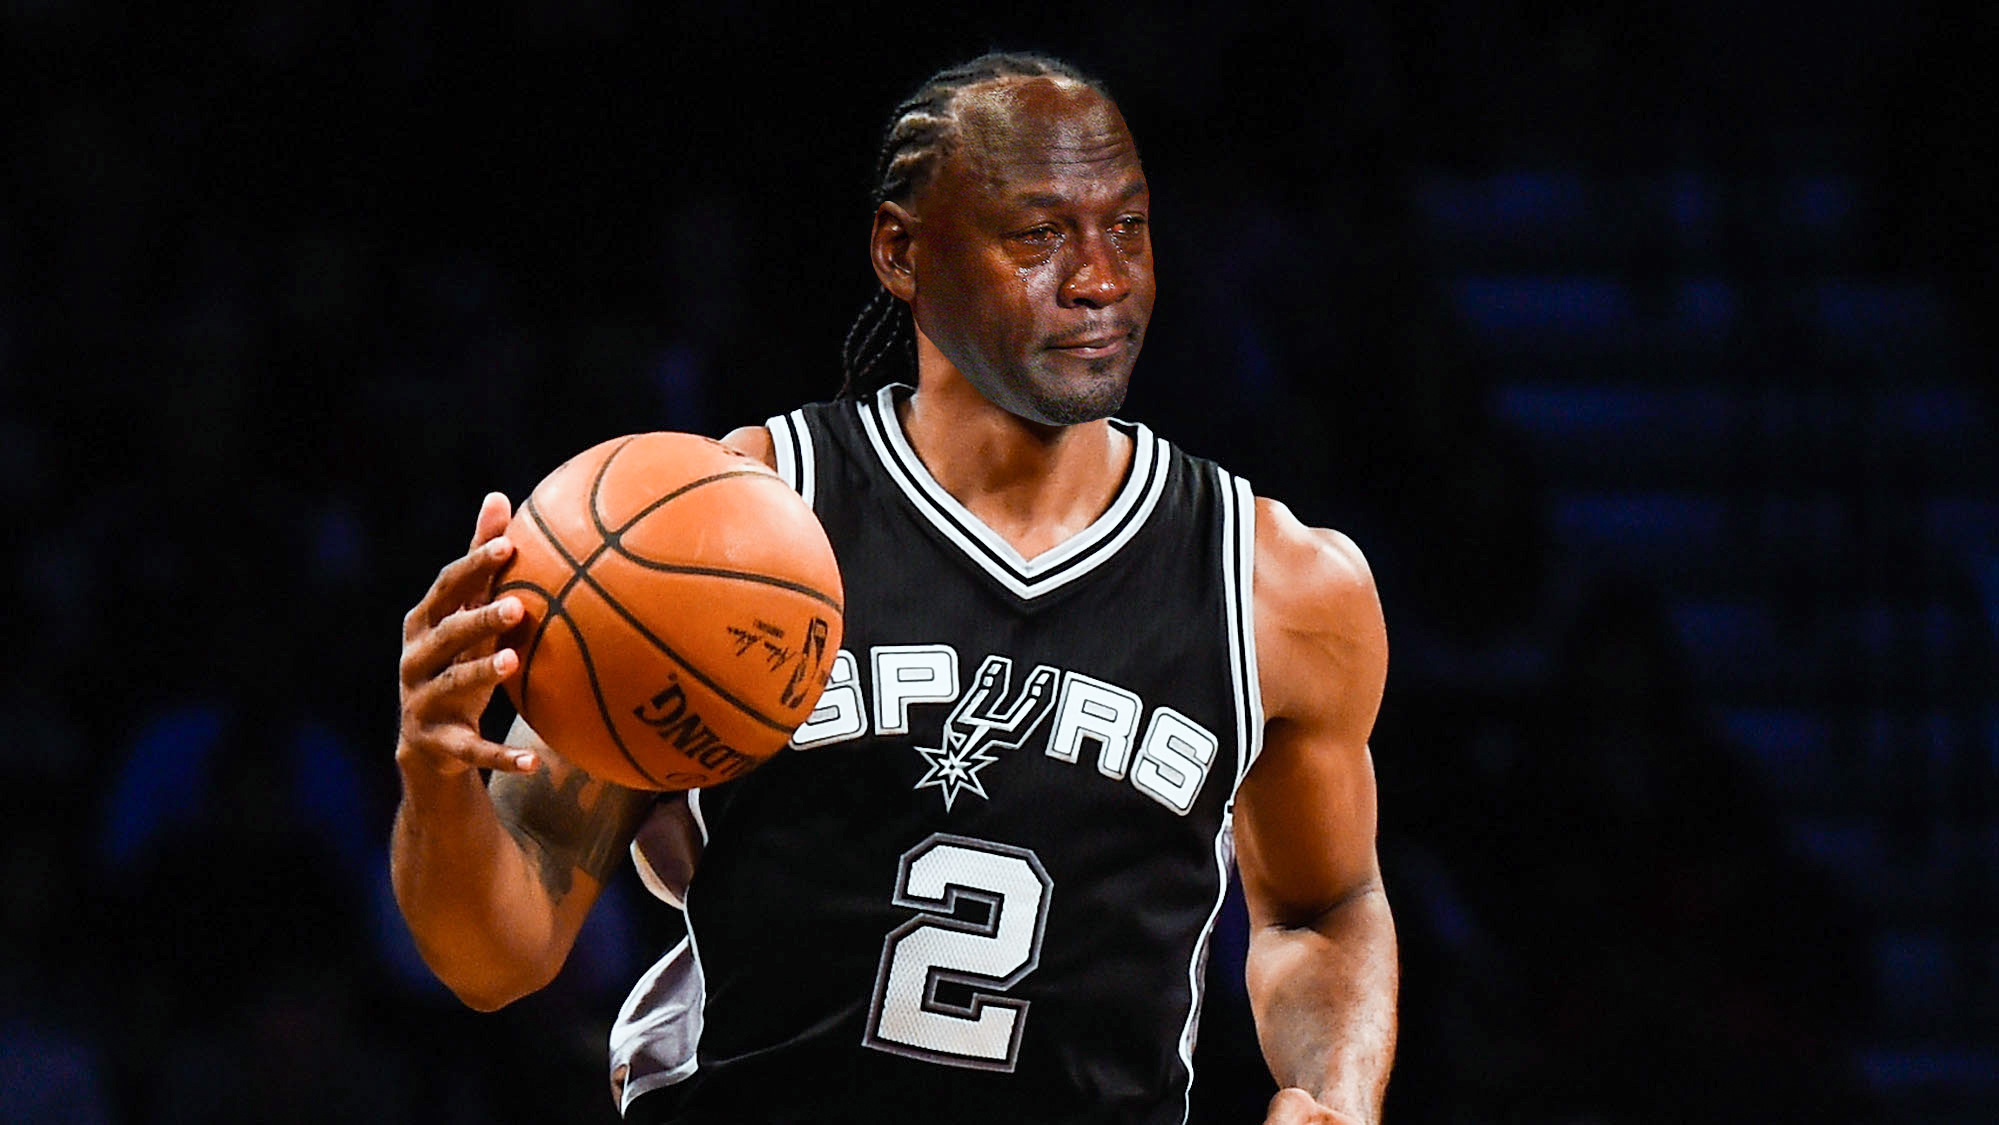 Kawhi Leonard Has No Idea What The Crying Jordan Meme Is